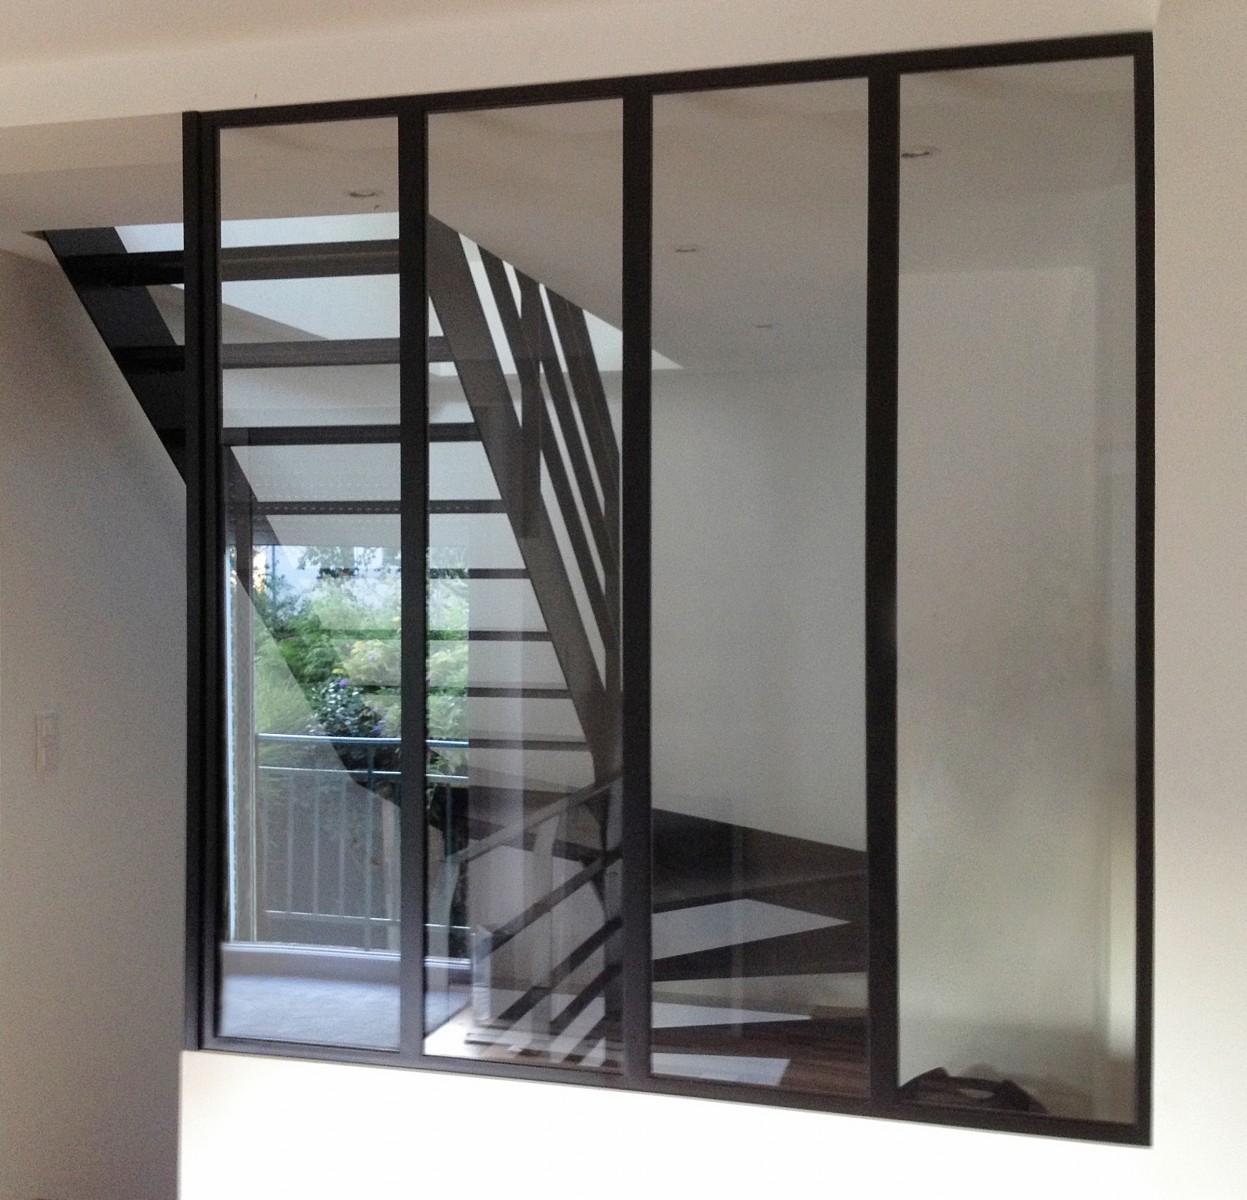 Verri re atelier for Baie vitree style atelier prix